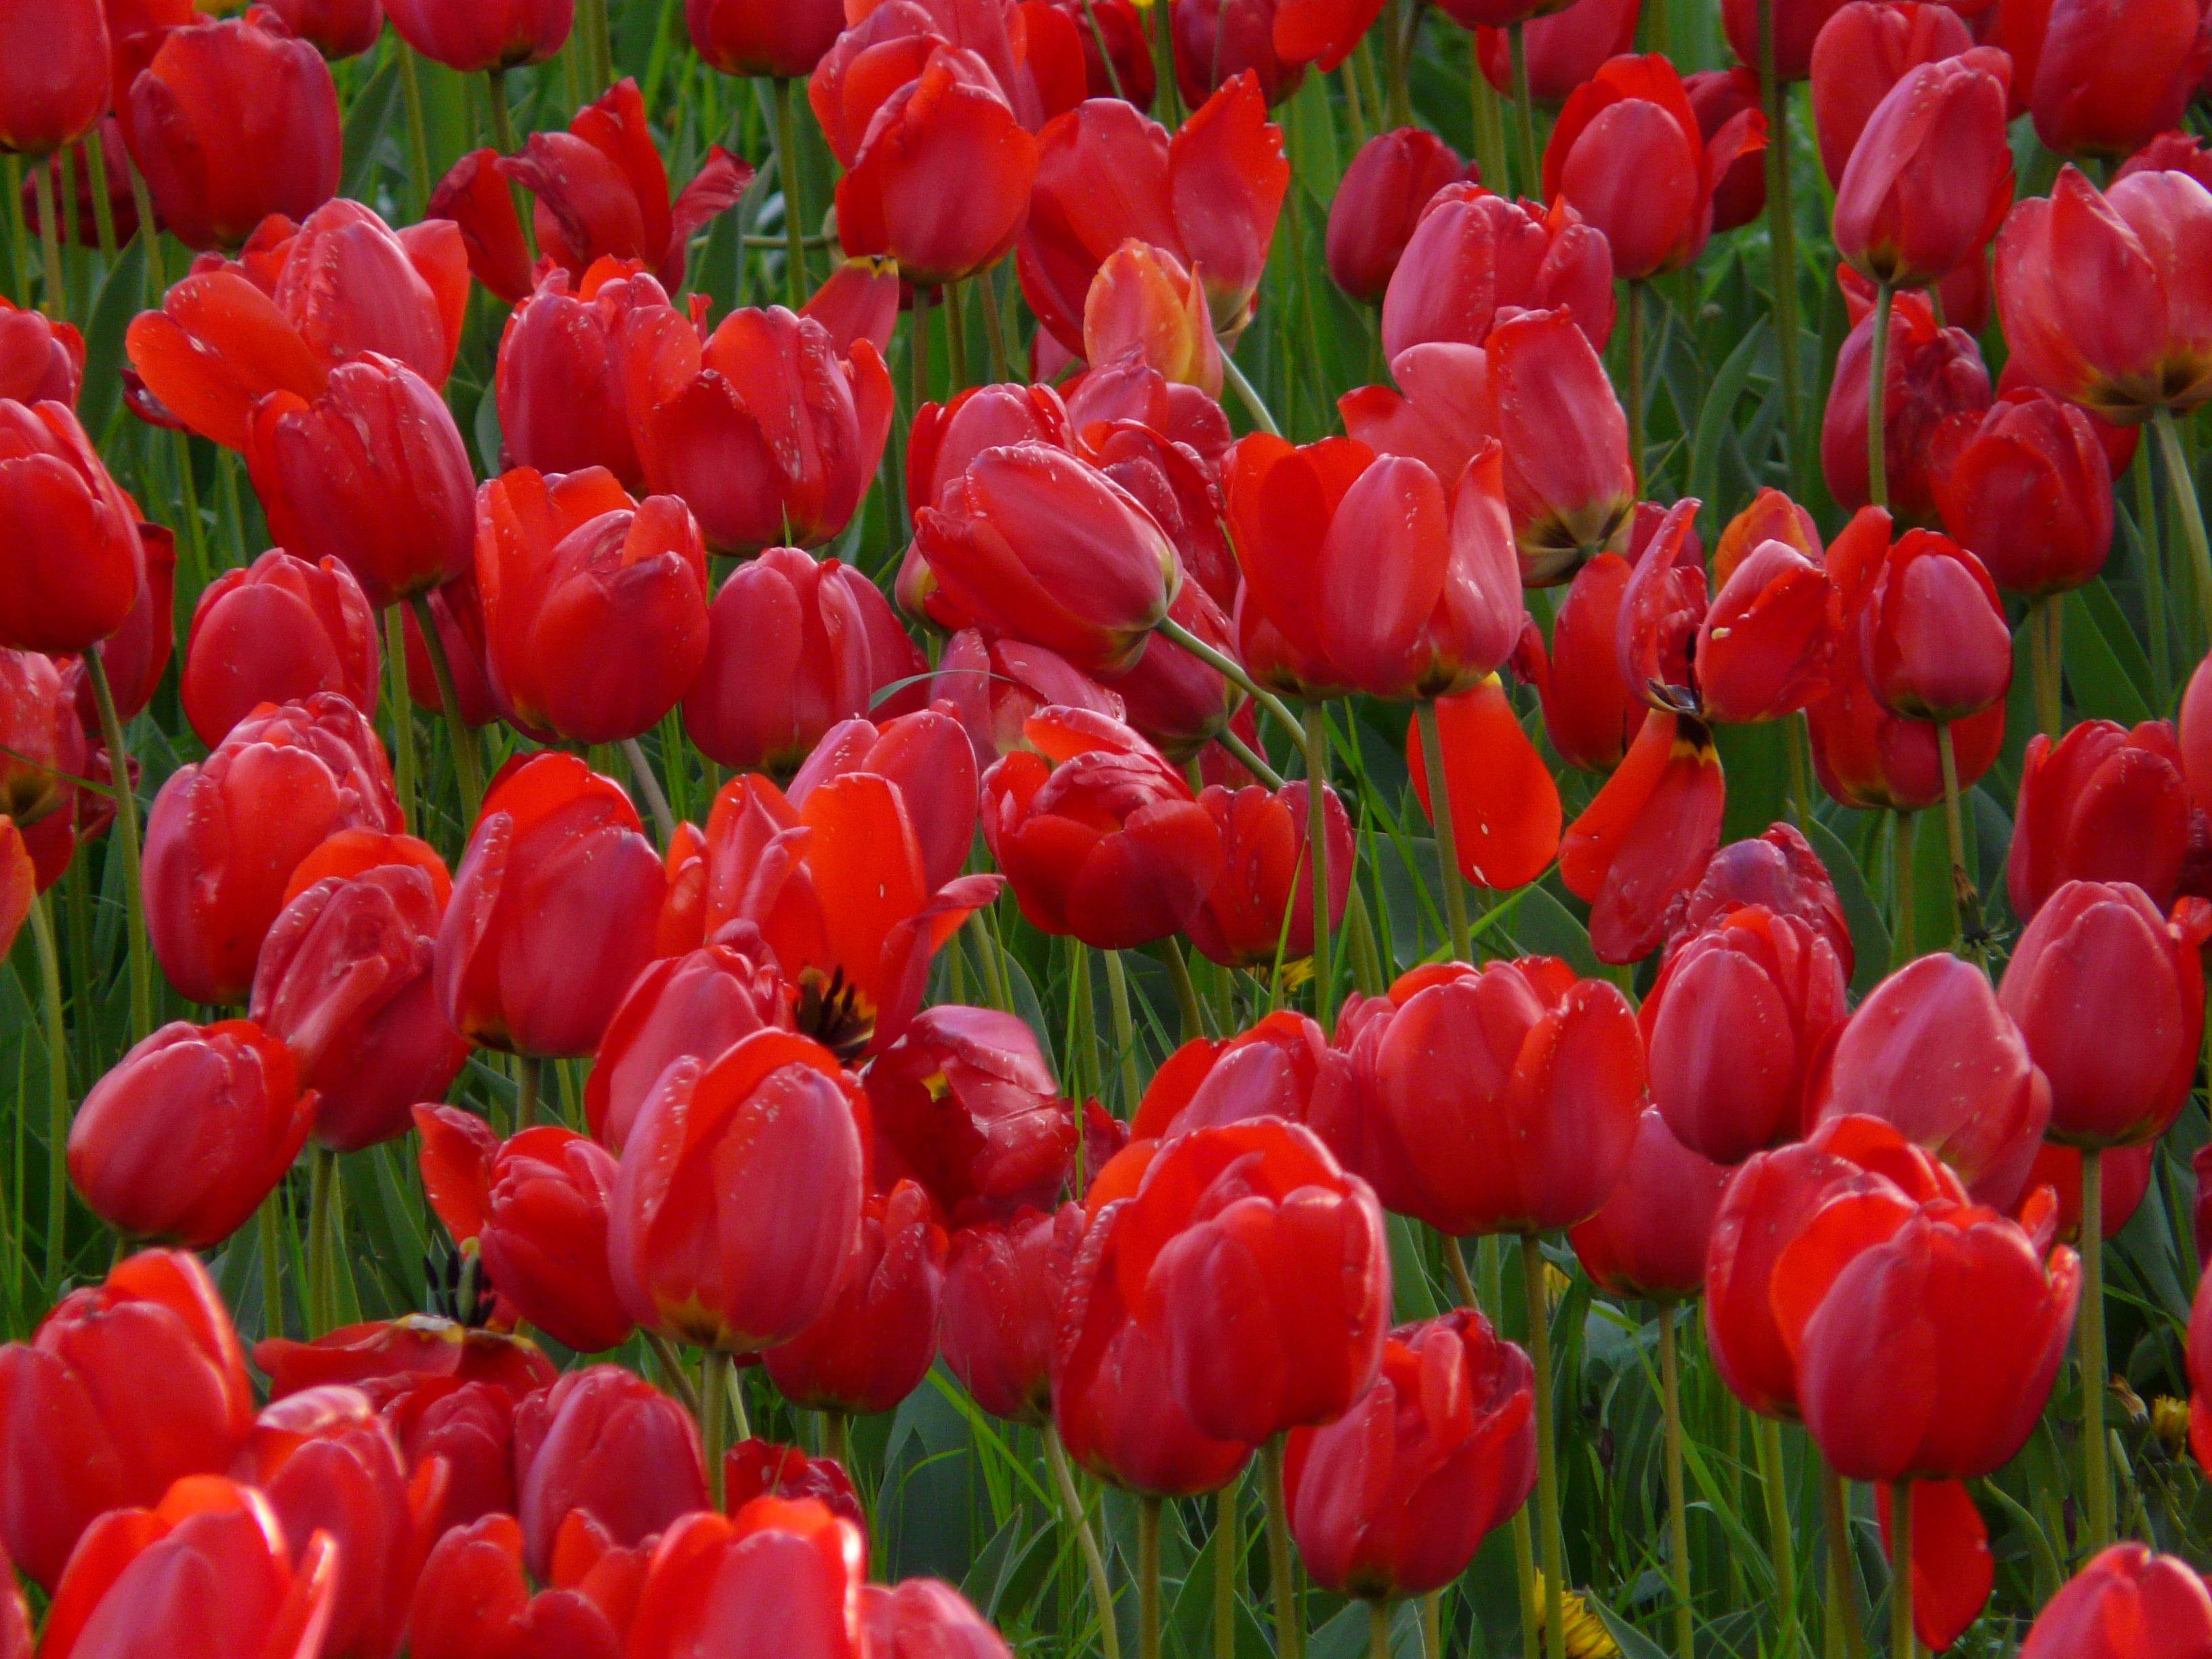 Free Images : landscape, nature, outdoor, blossom, sunlight, petal ...